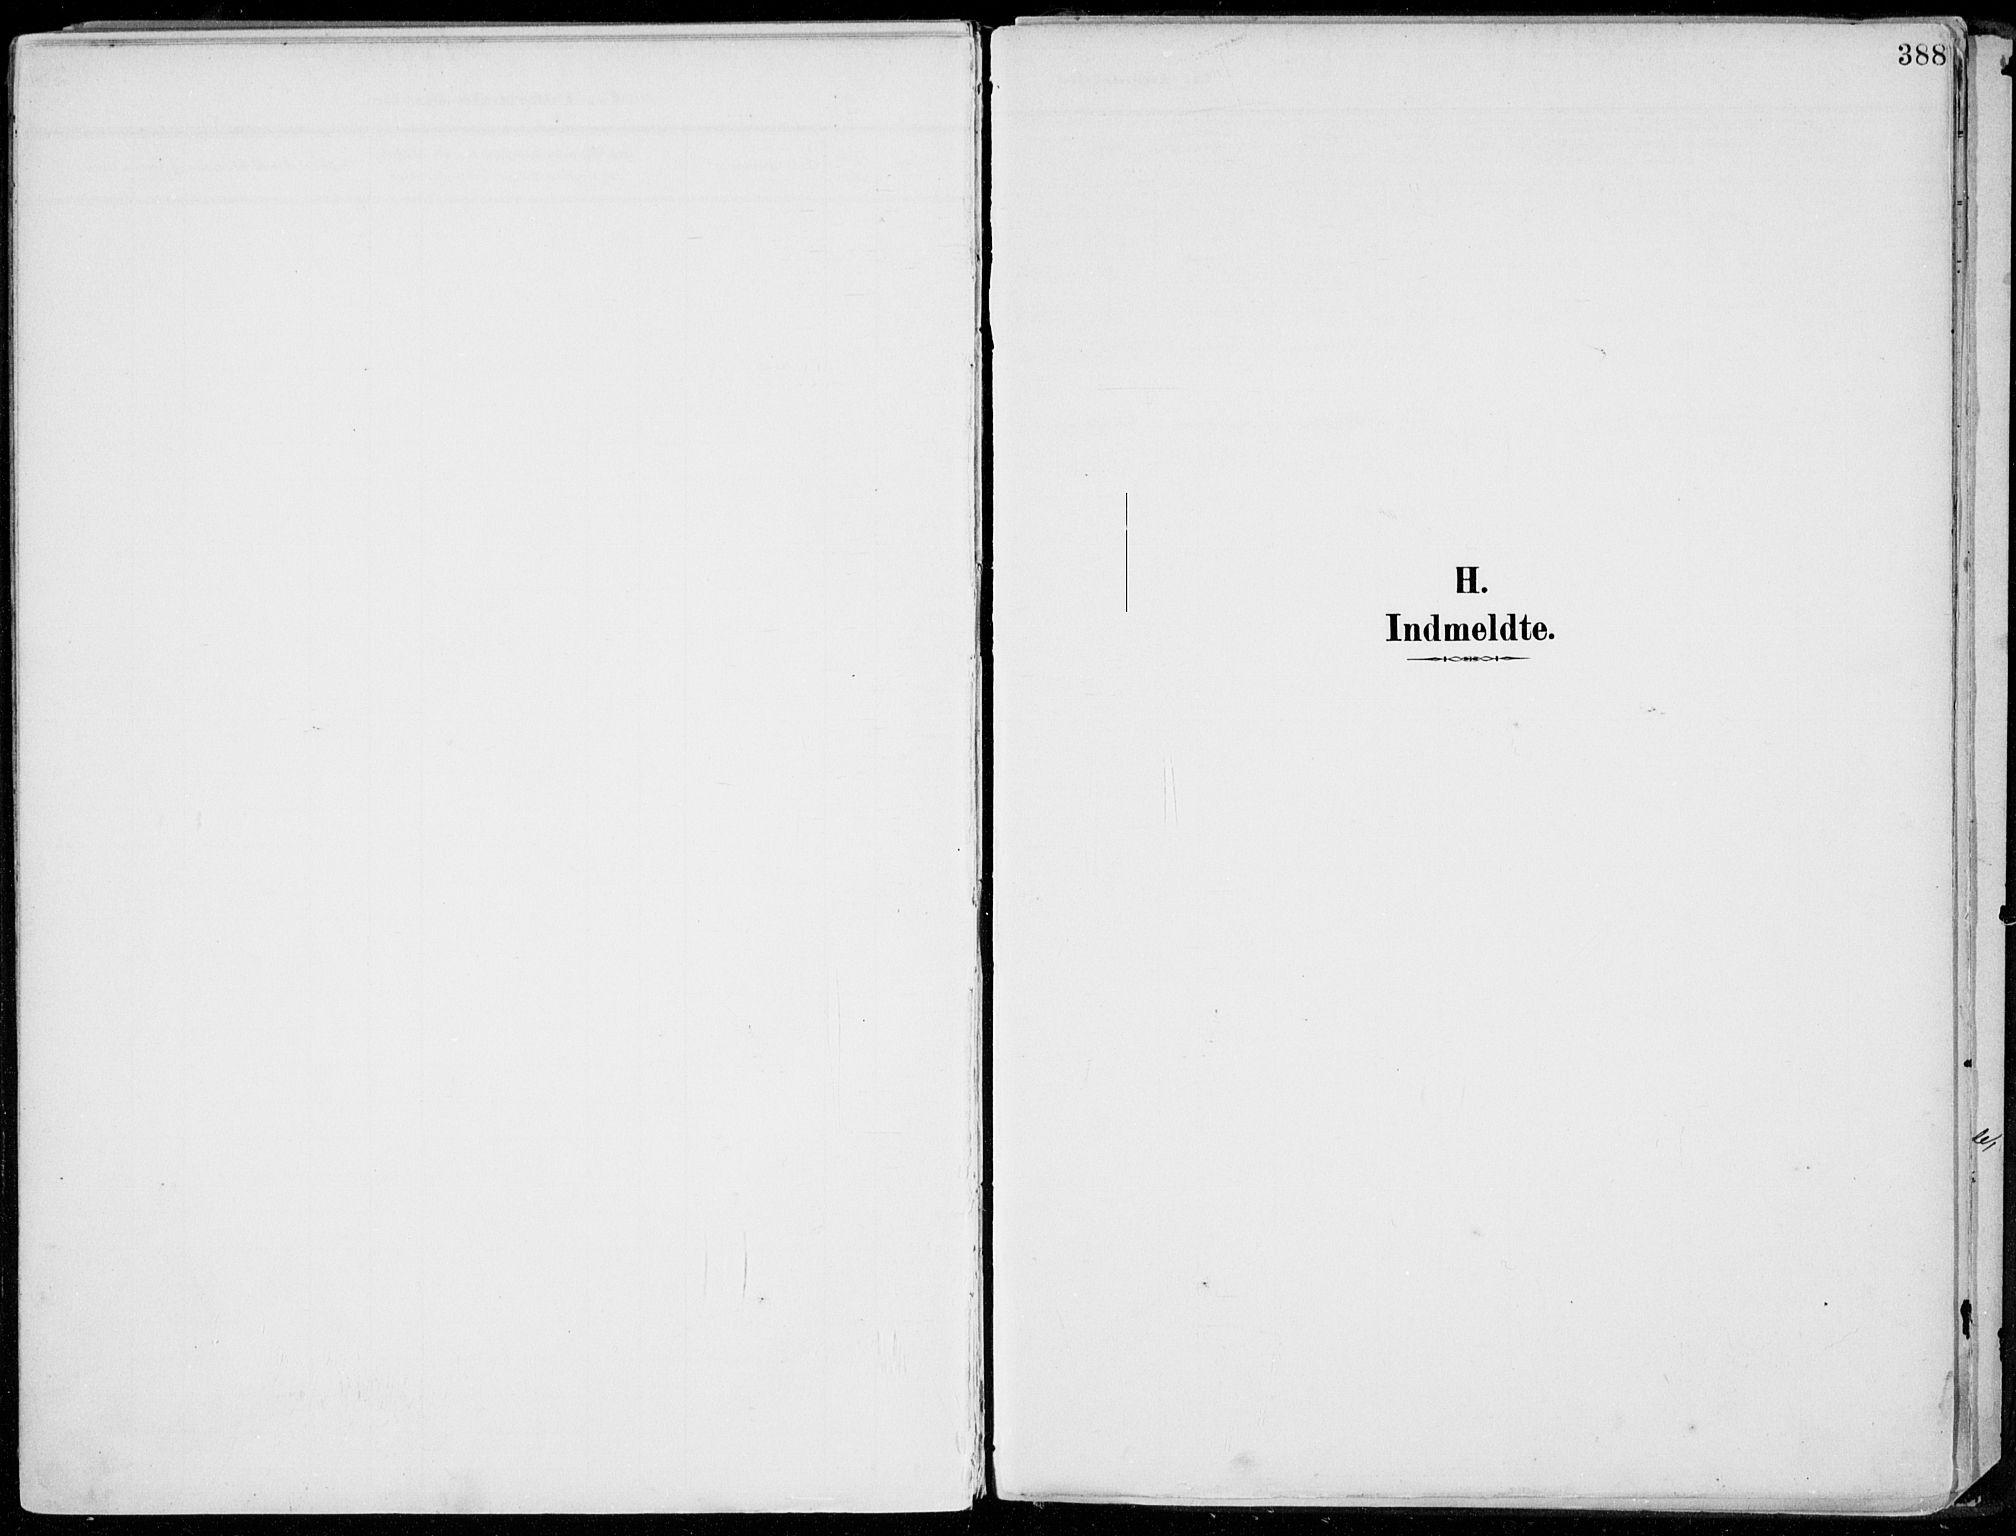 SAH, Lillehammer prestekontor, Ministerialbok nr. 1, 1901-1916, s. 388